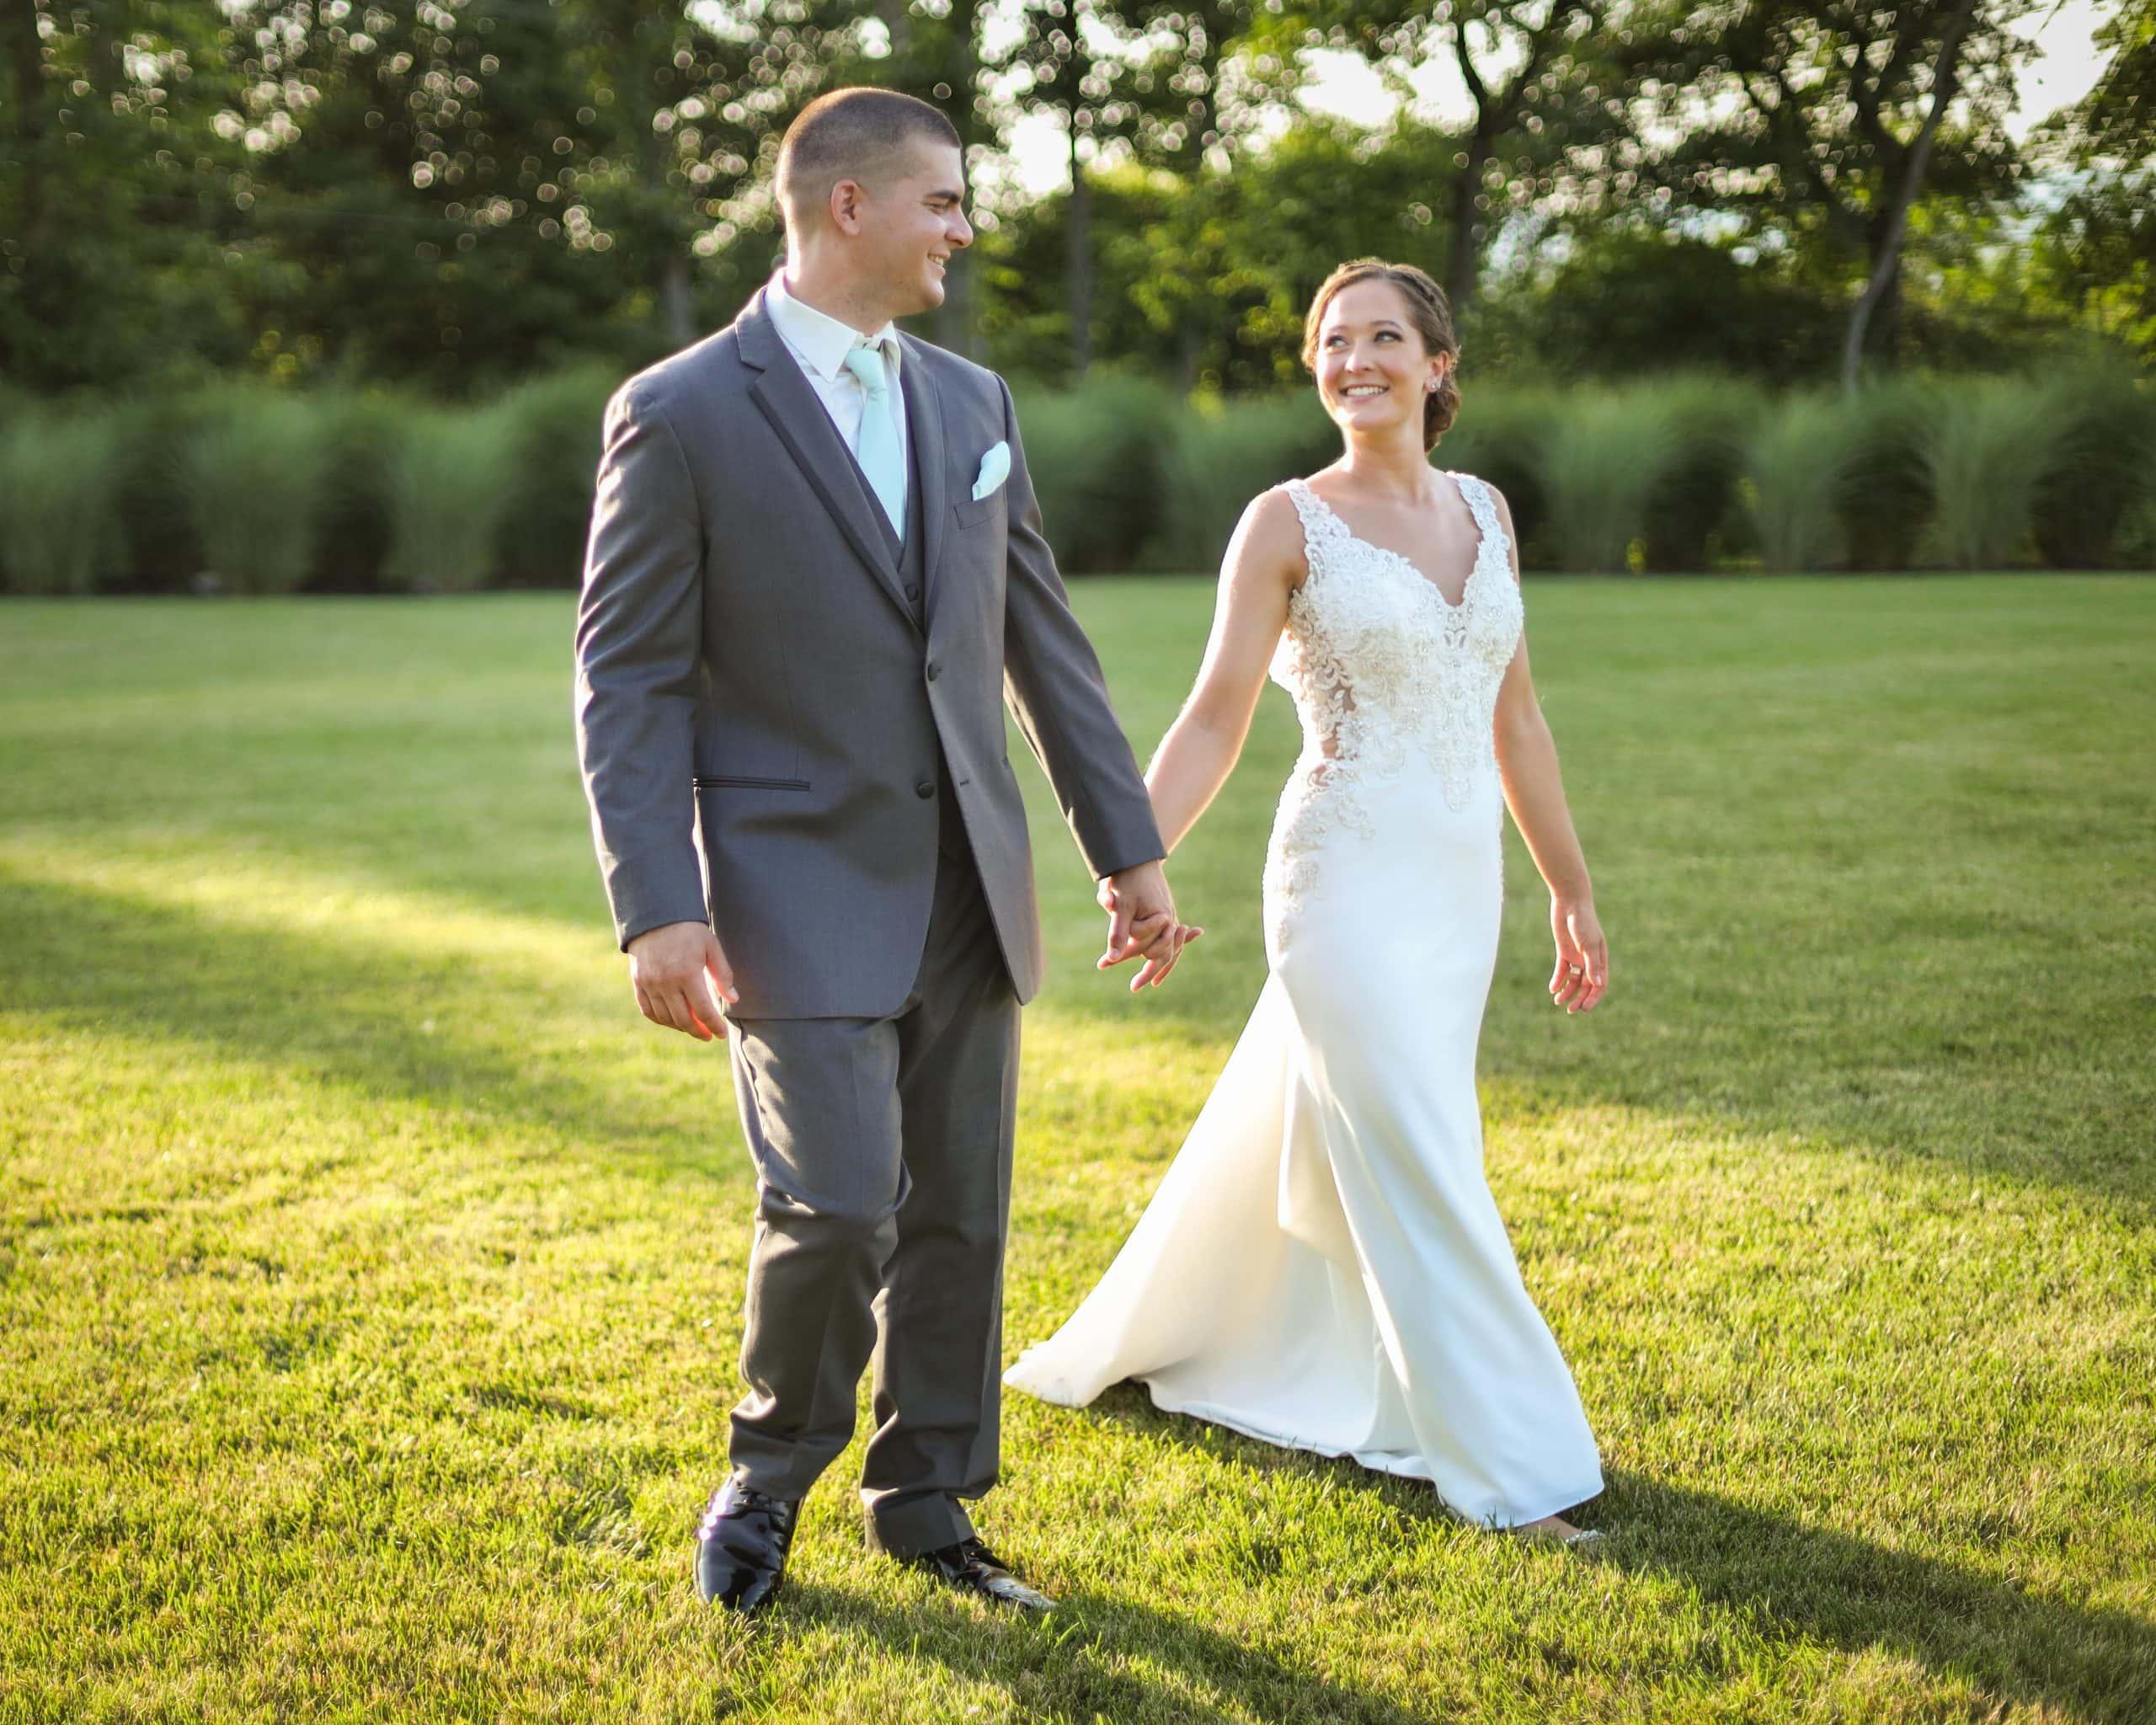 modern-bride-Campaign-Blue-Mountain-Resort-Palmerton, PA 18071-lightmaster-studios-2